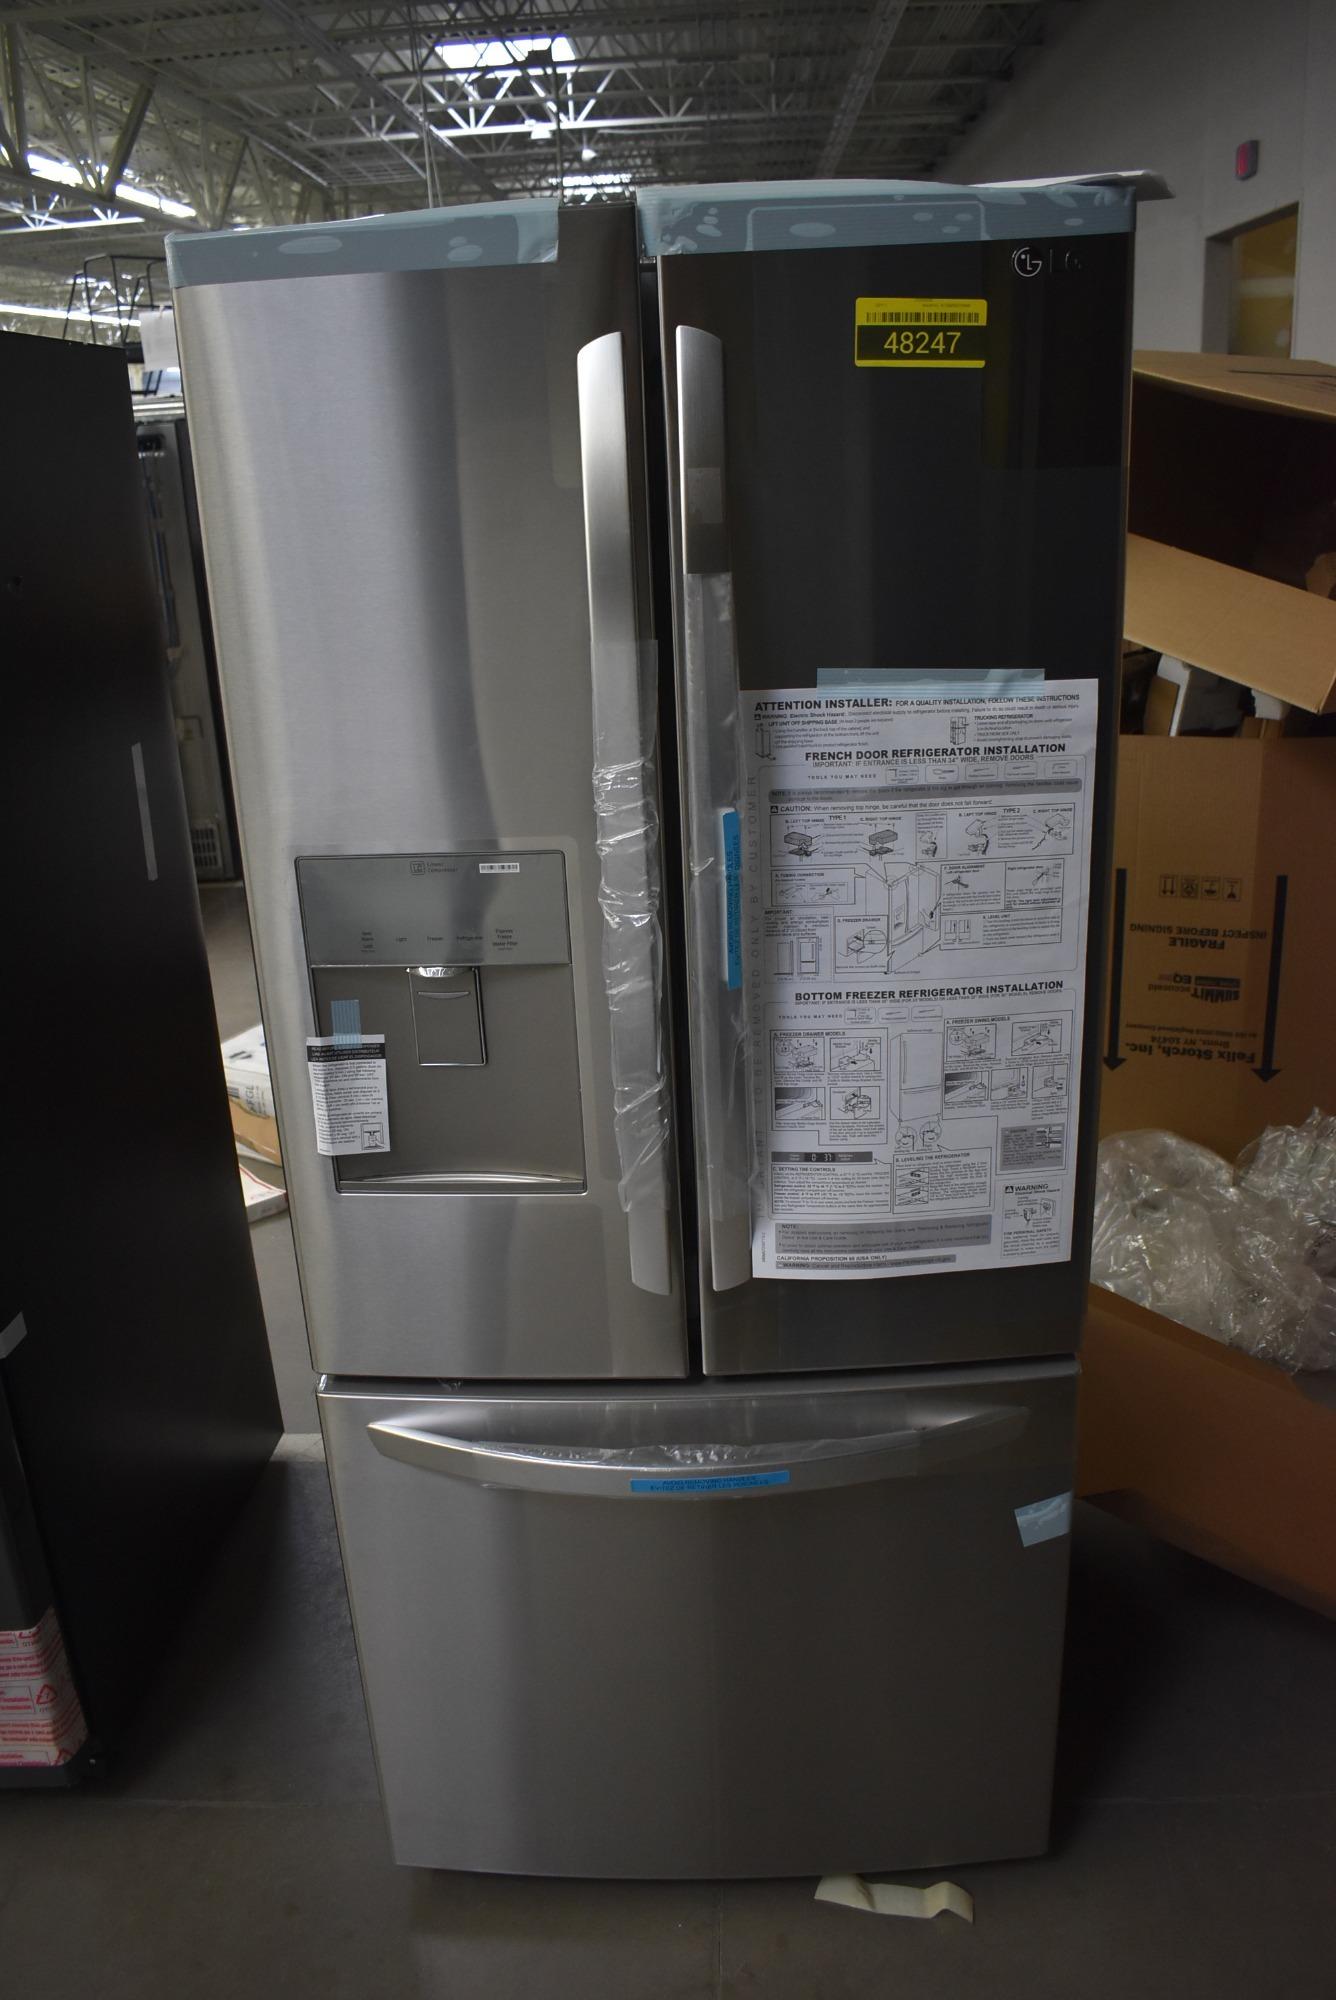 LG LFDS22520S 30